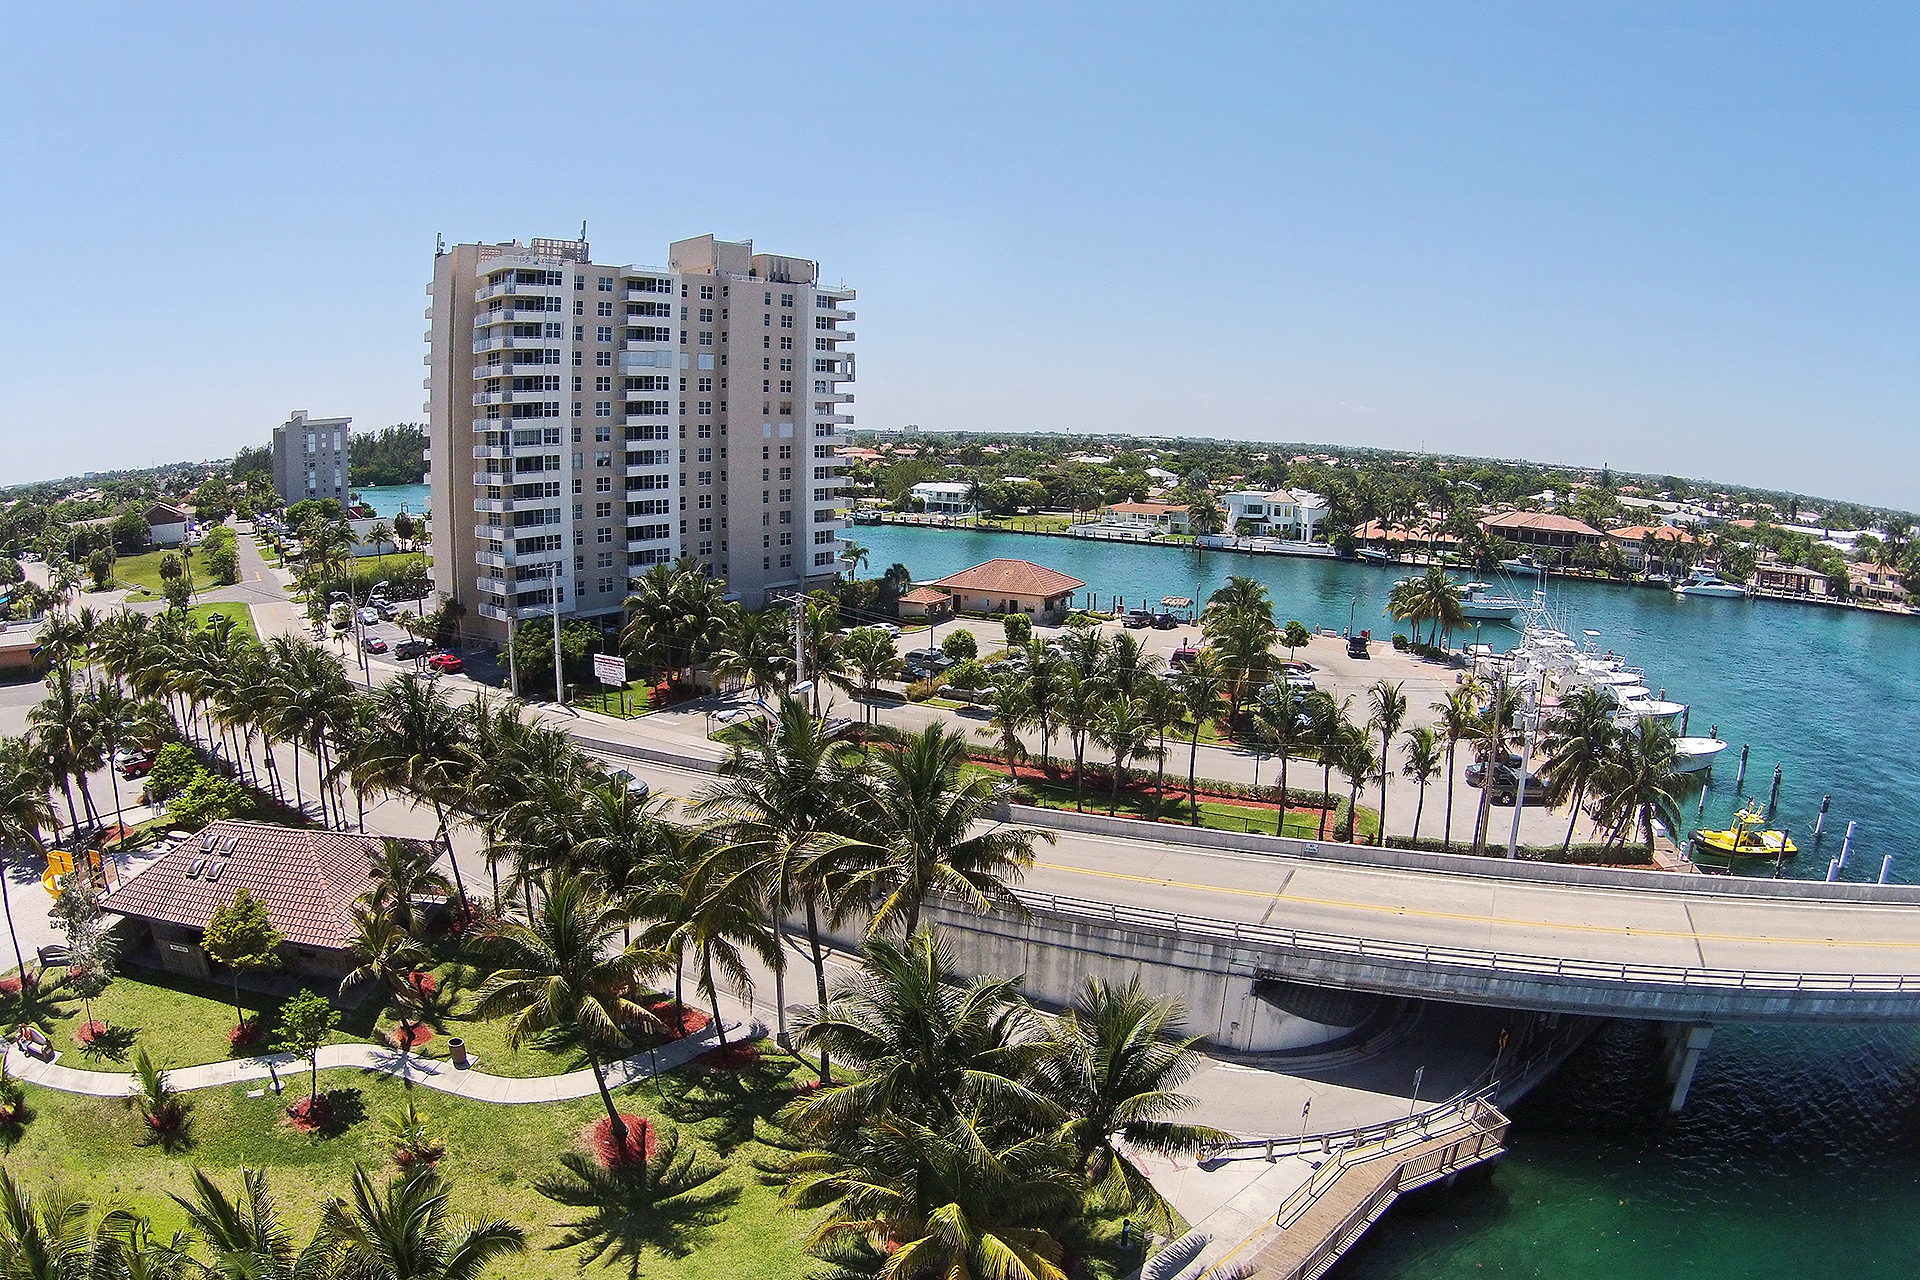 Deerfield Beach, Florida; Courtesy of Ivan Cholakov/Shutterstock.com